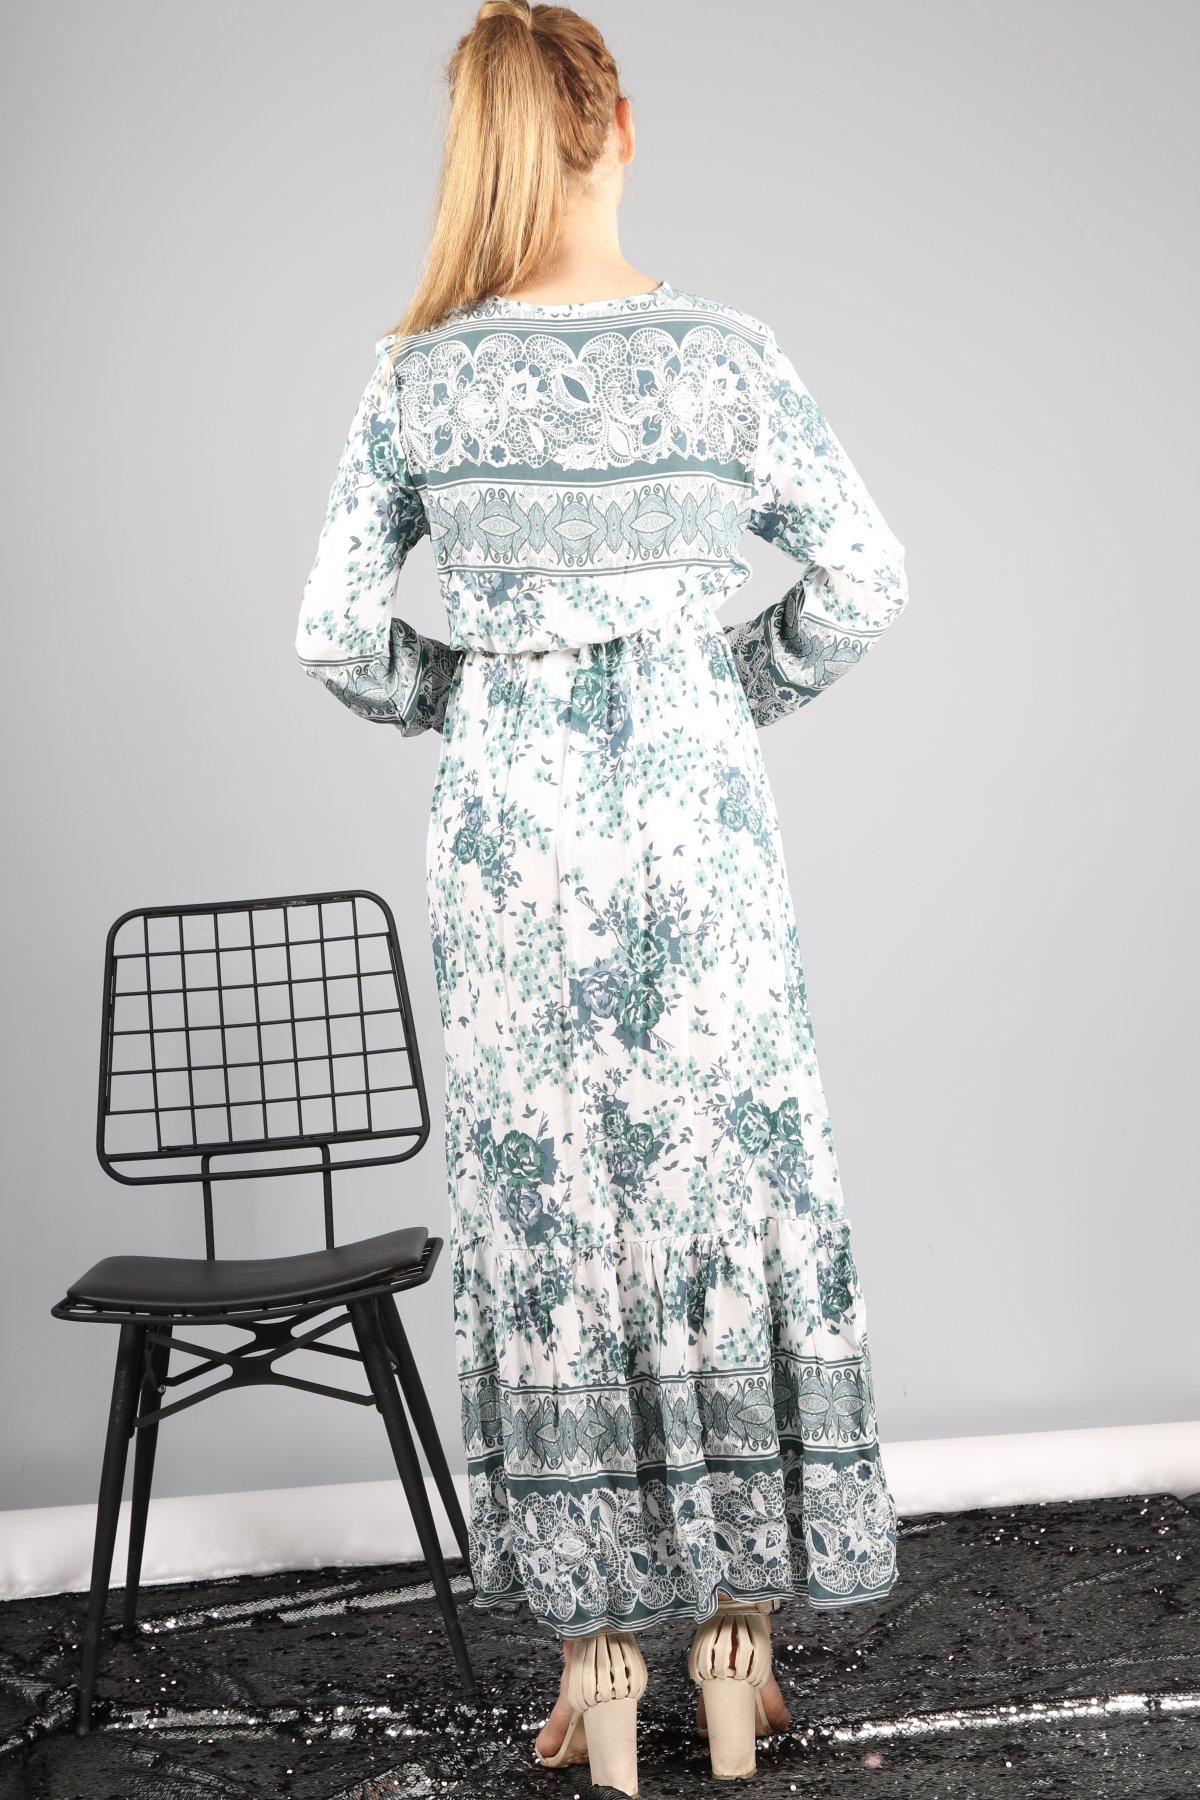 Modif Gül Desen Elbise